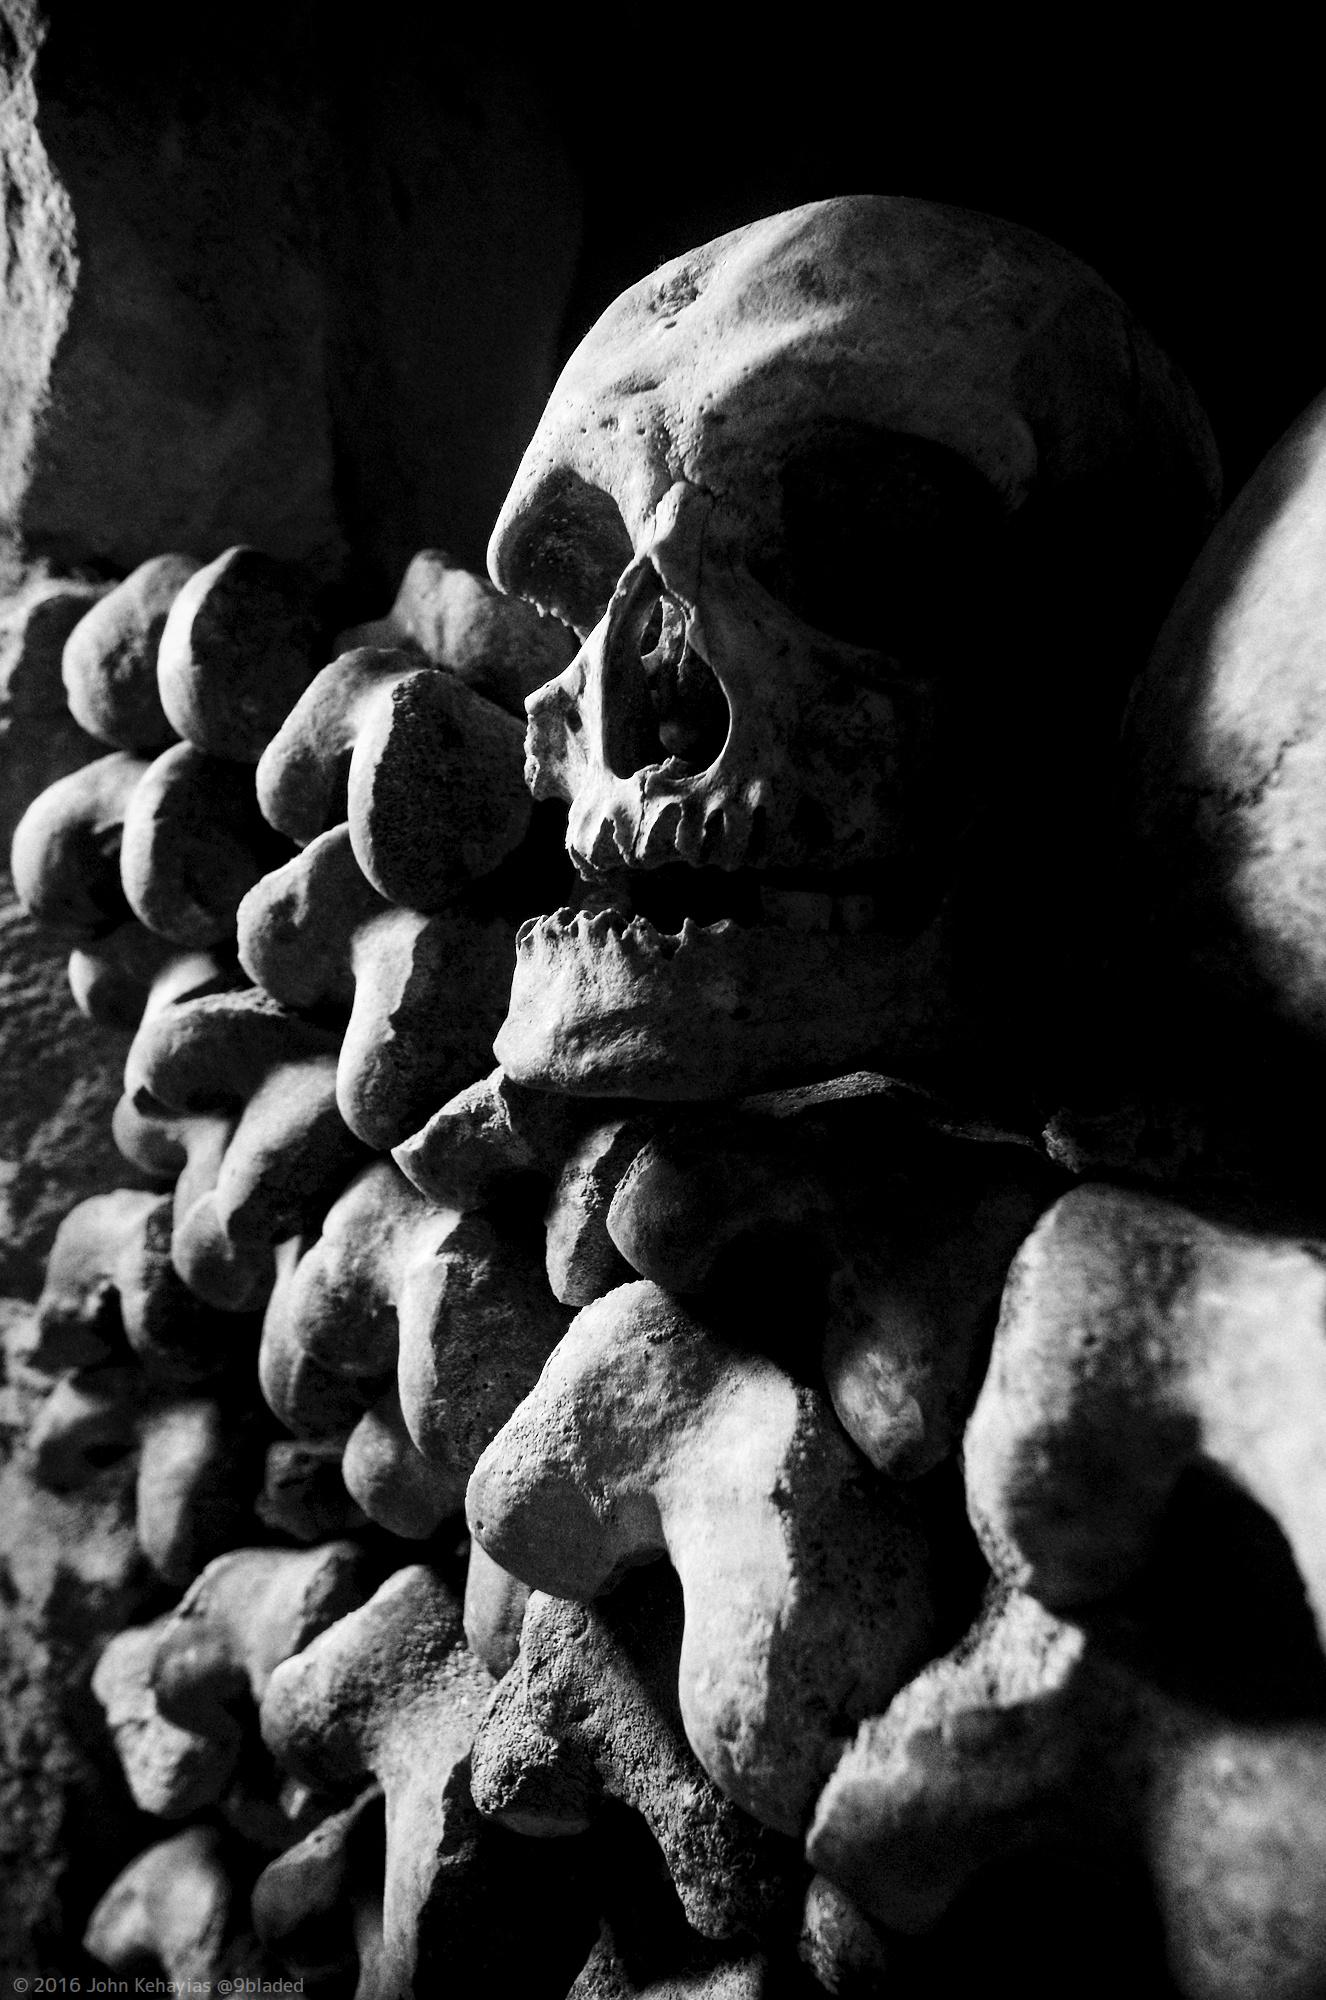 On My Perch Of Bones